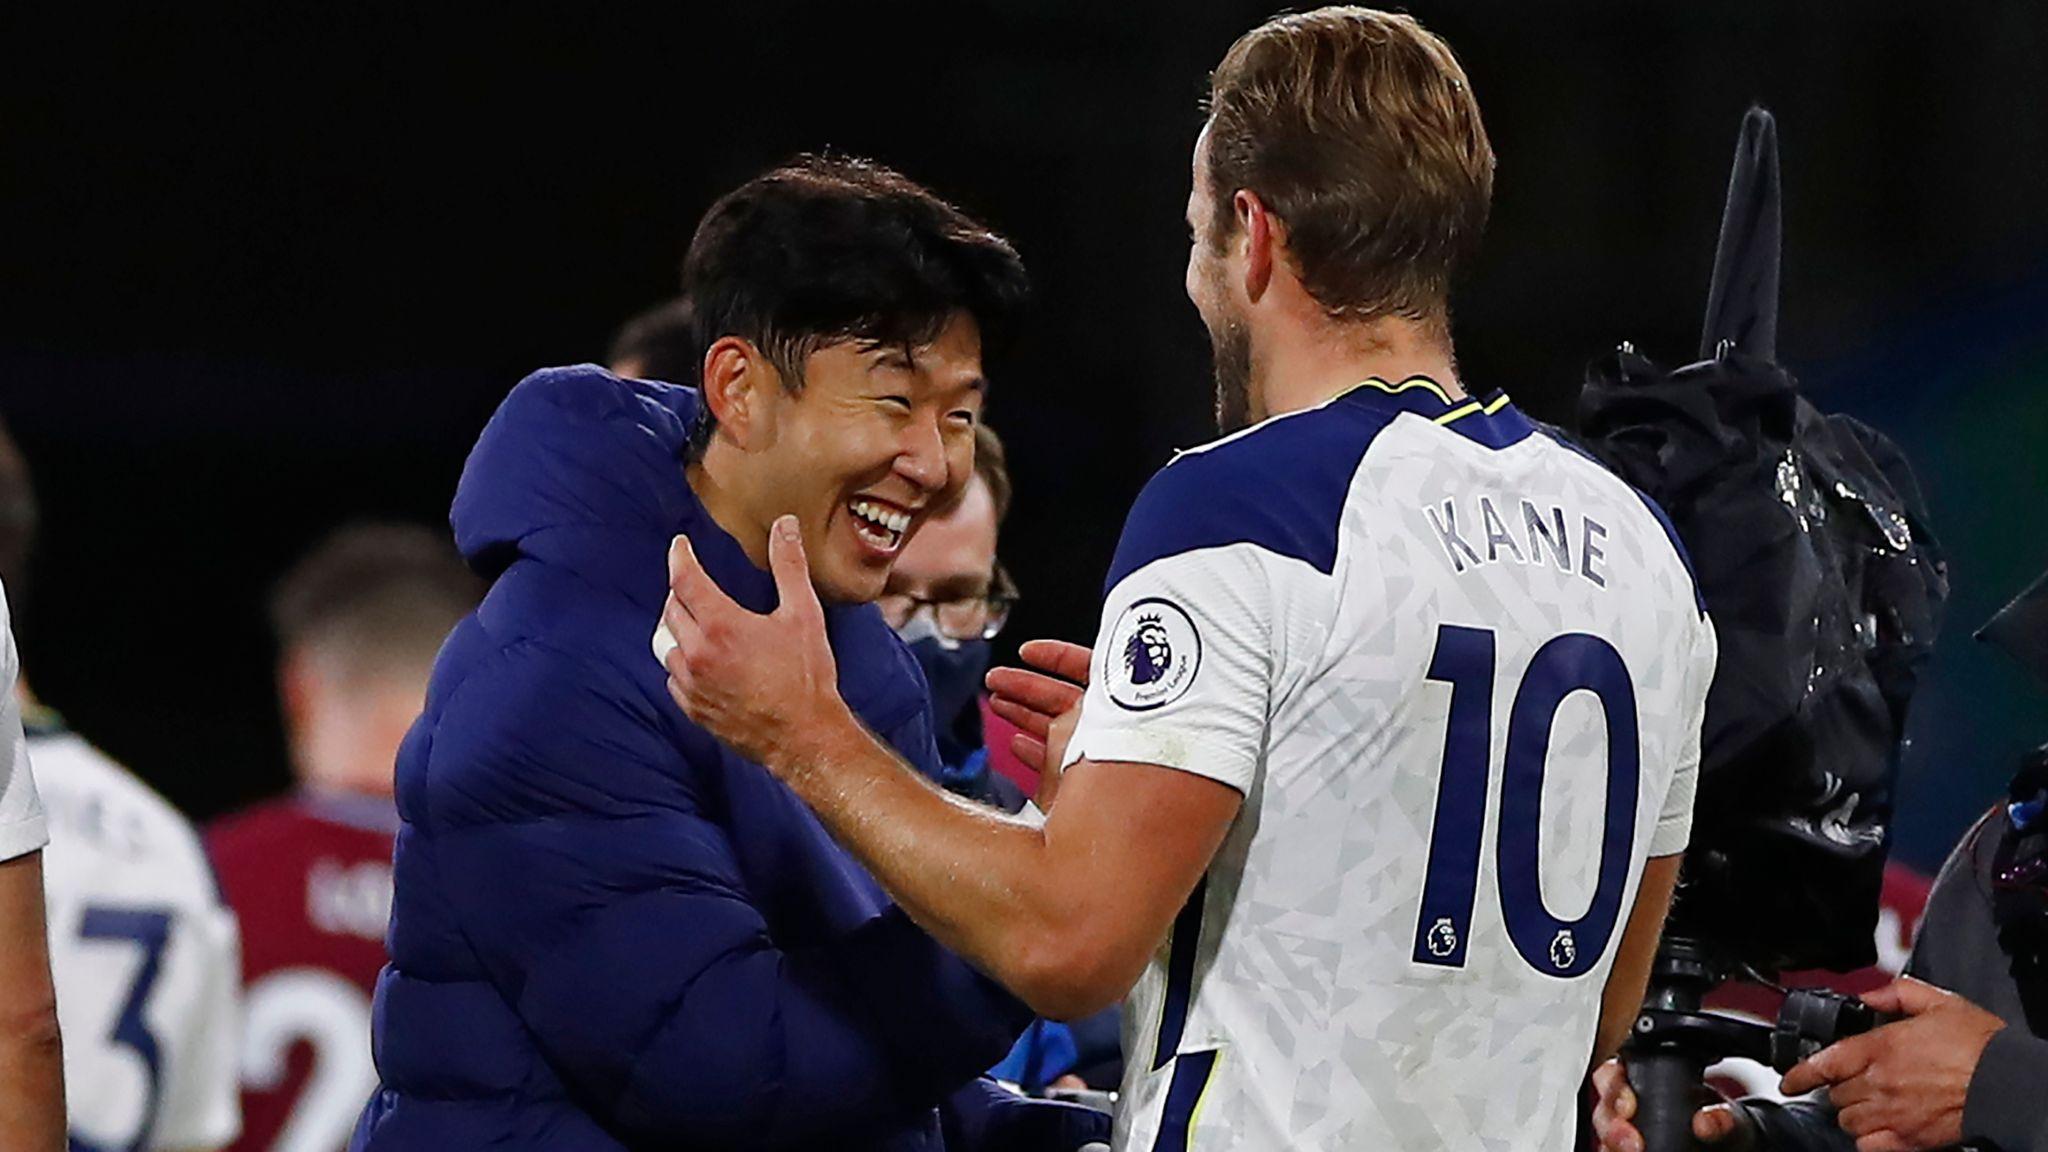 Spurs / Premier League / England / انگلیس / کره جنوبی / لیگ برتر